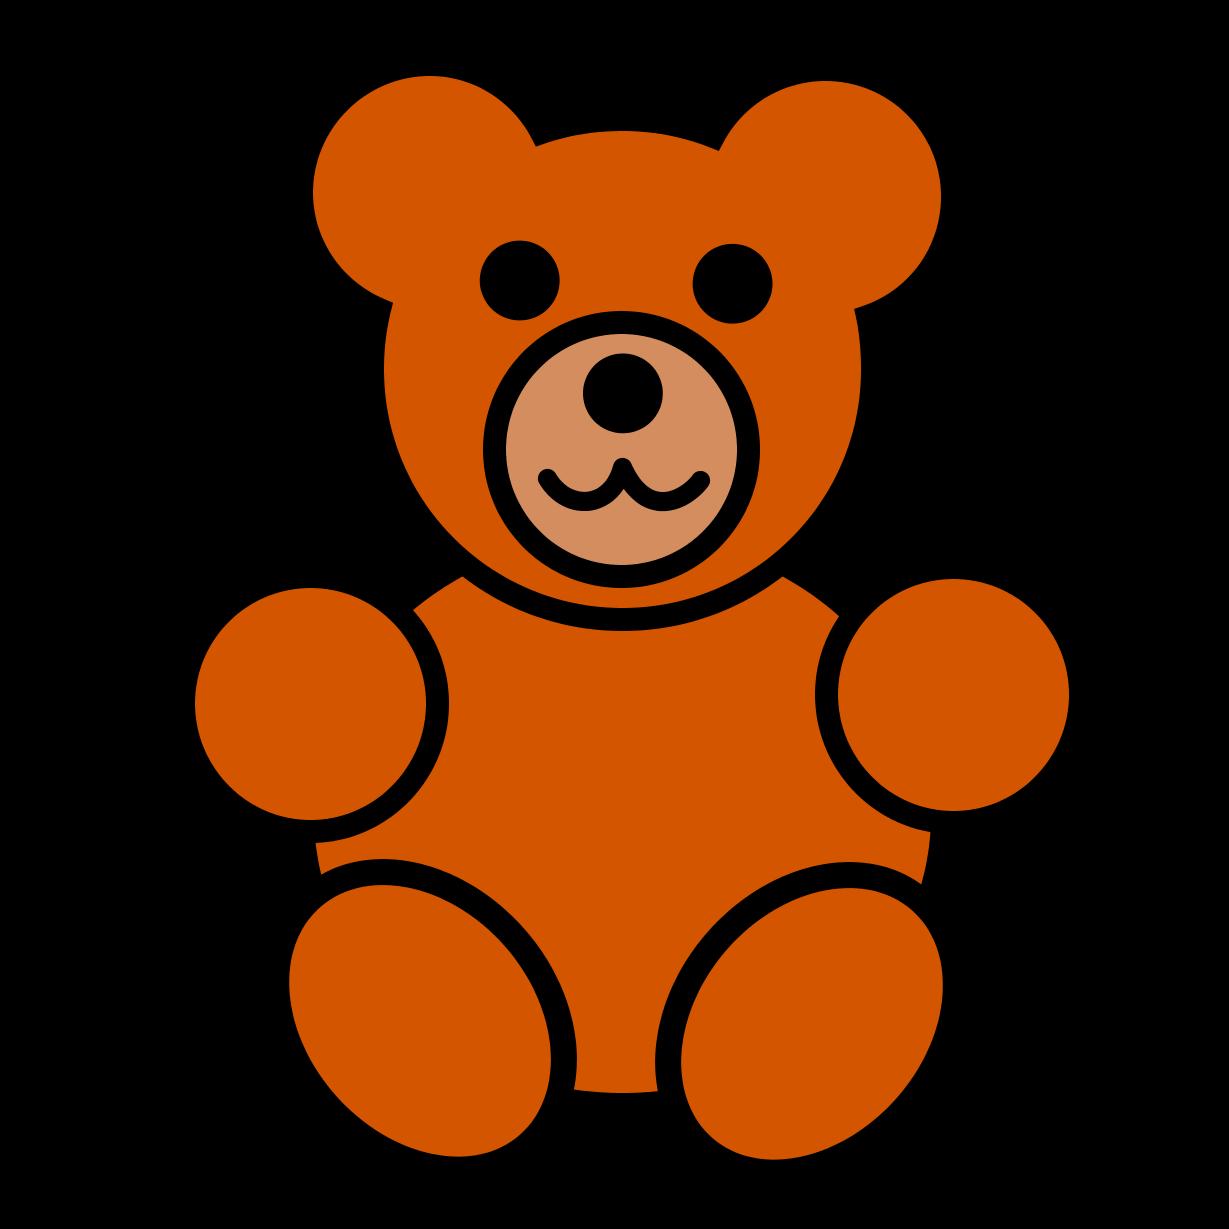 Teddy Bear Clipart Free Clipart Images 5-Teddy bear clipart free clipart images 5-15